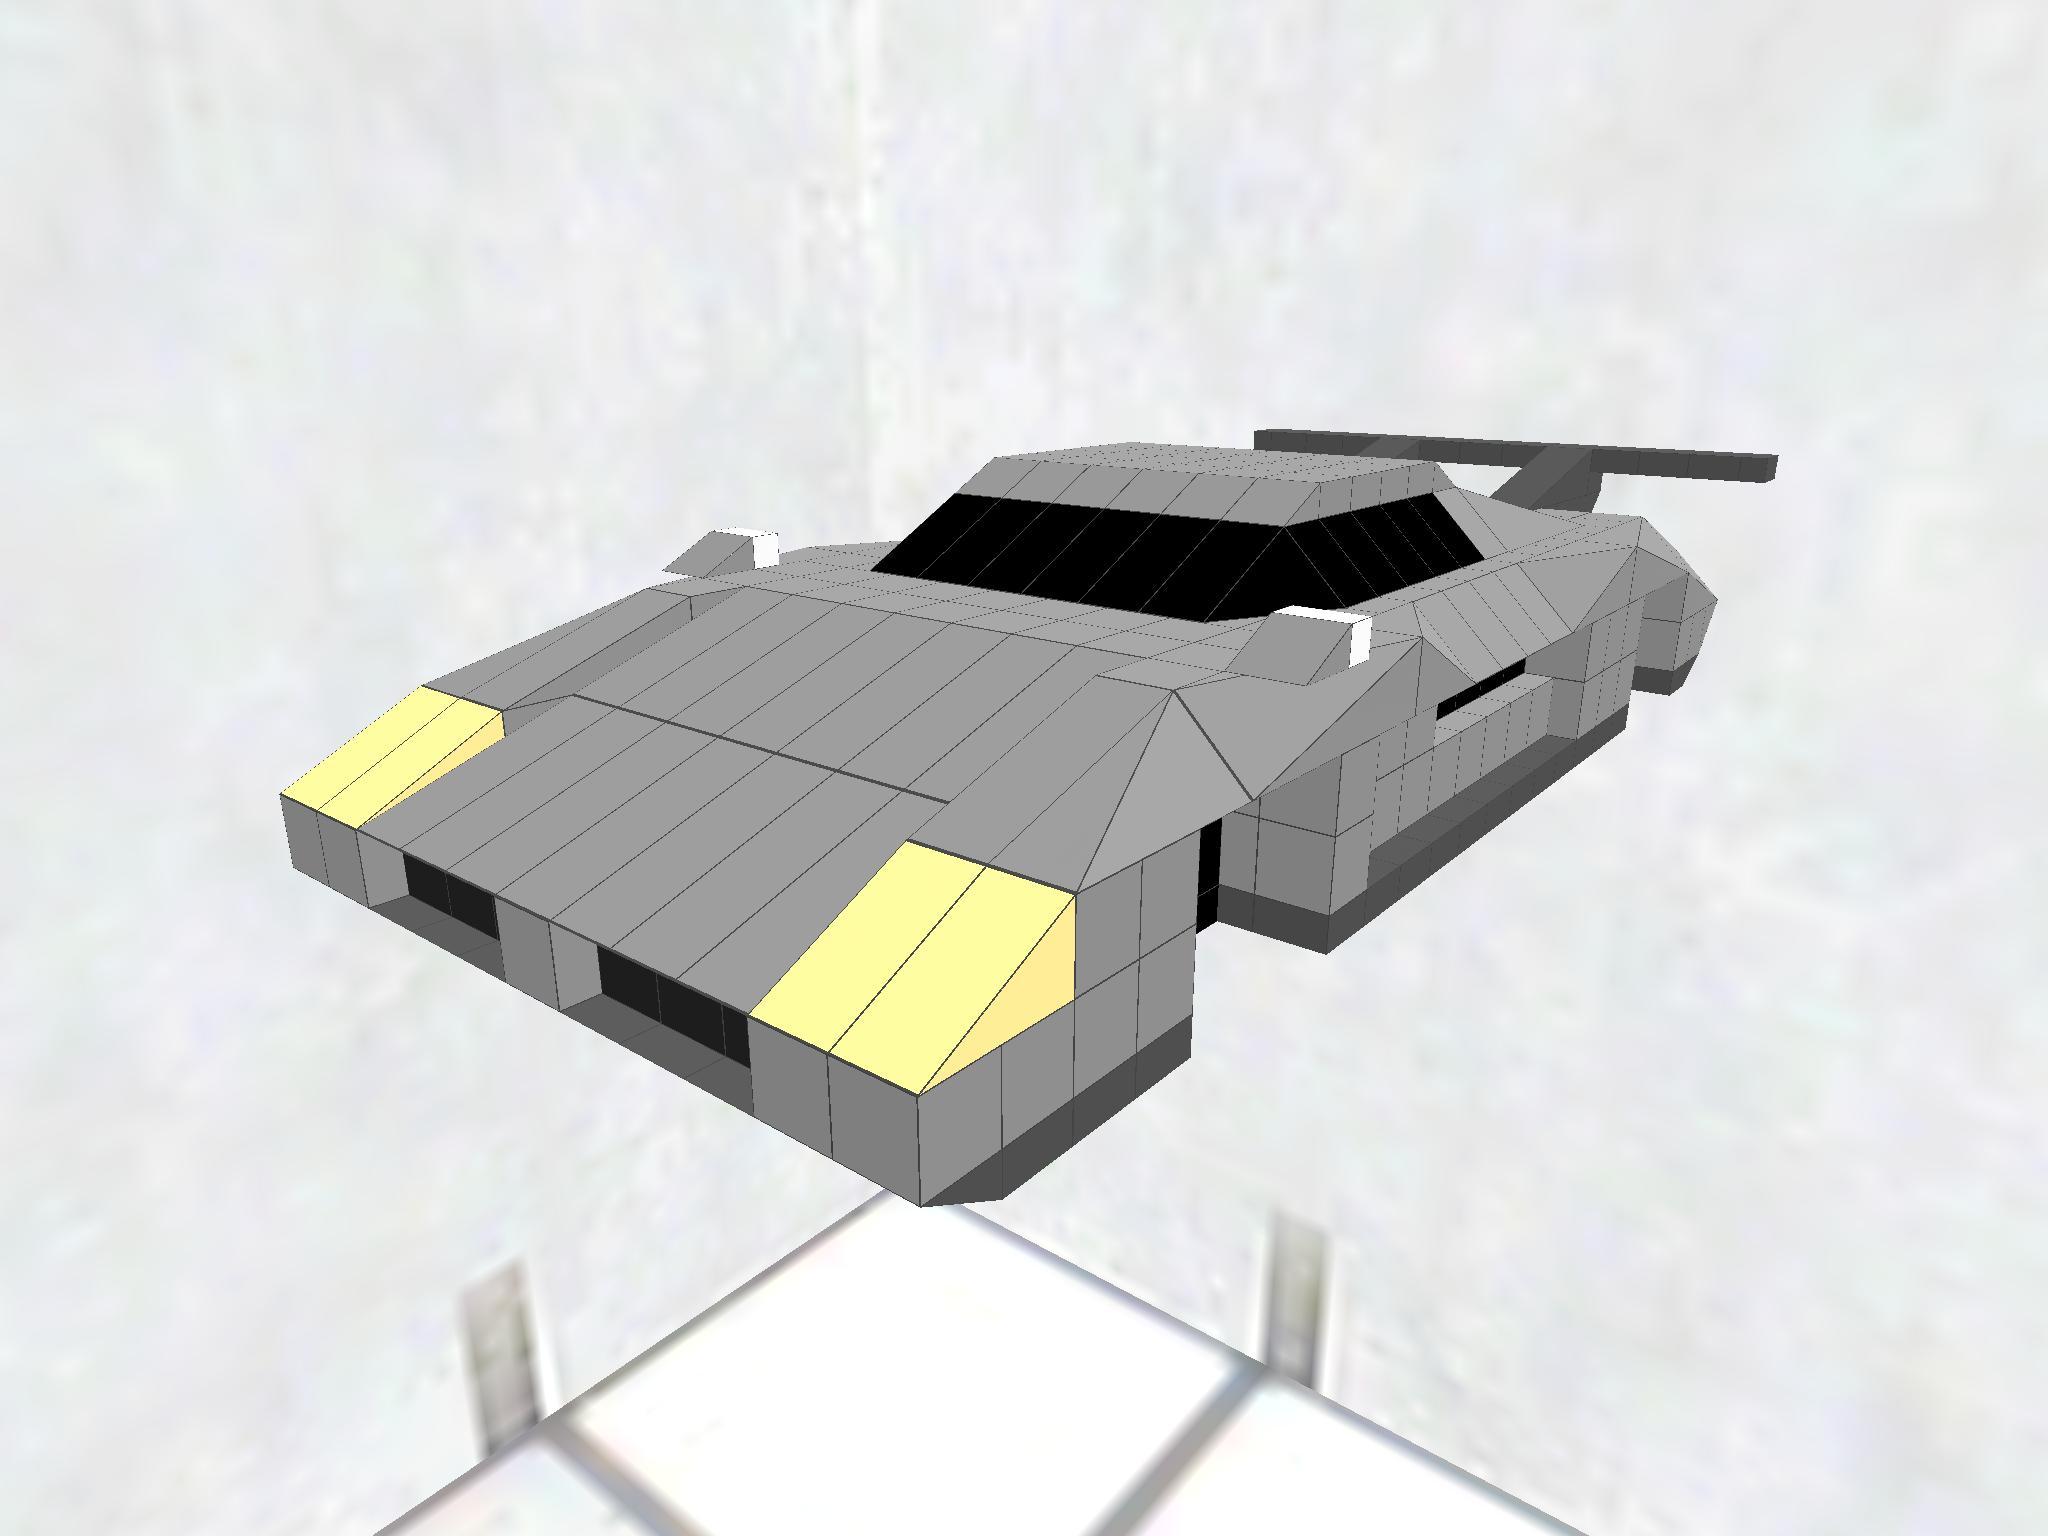 VecTrec Cerberus EVO1